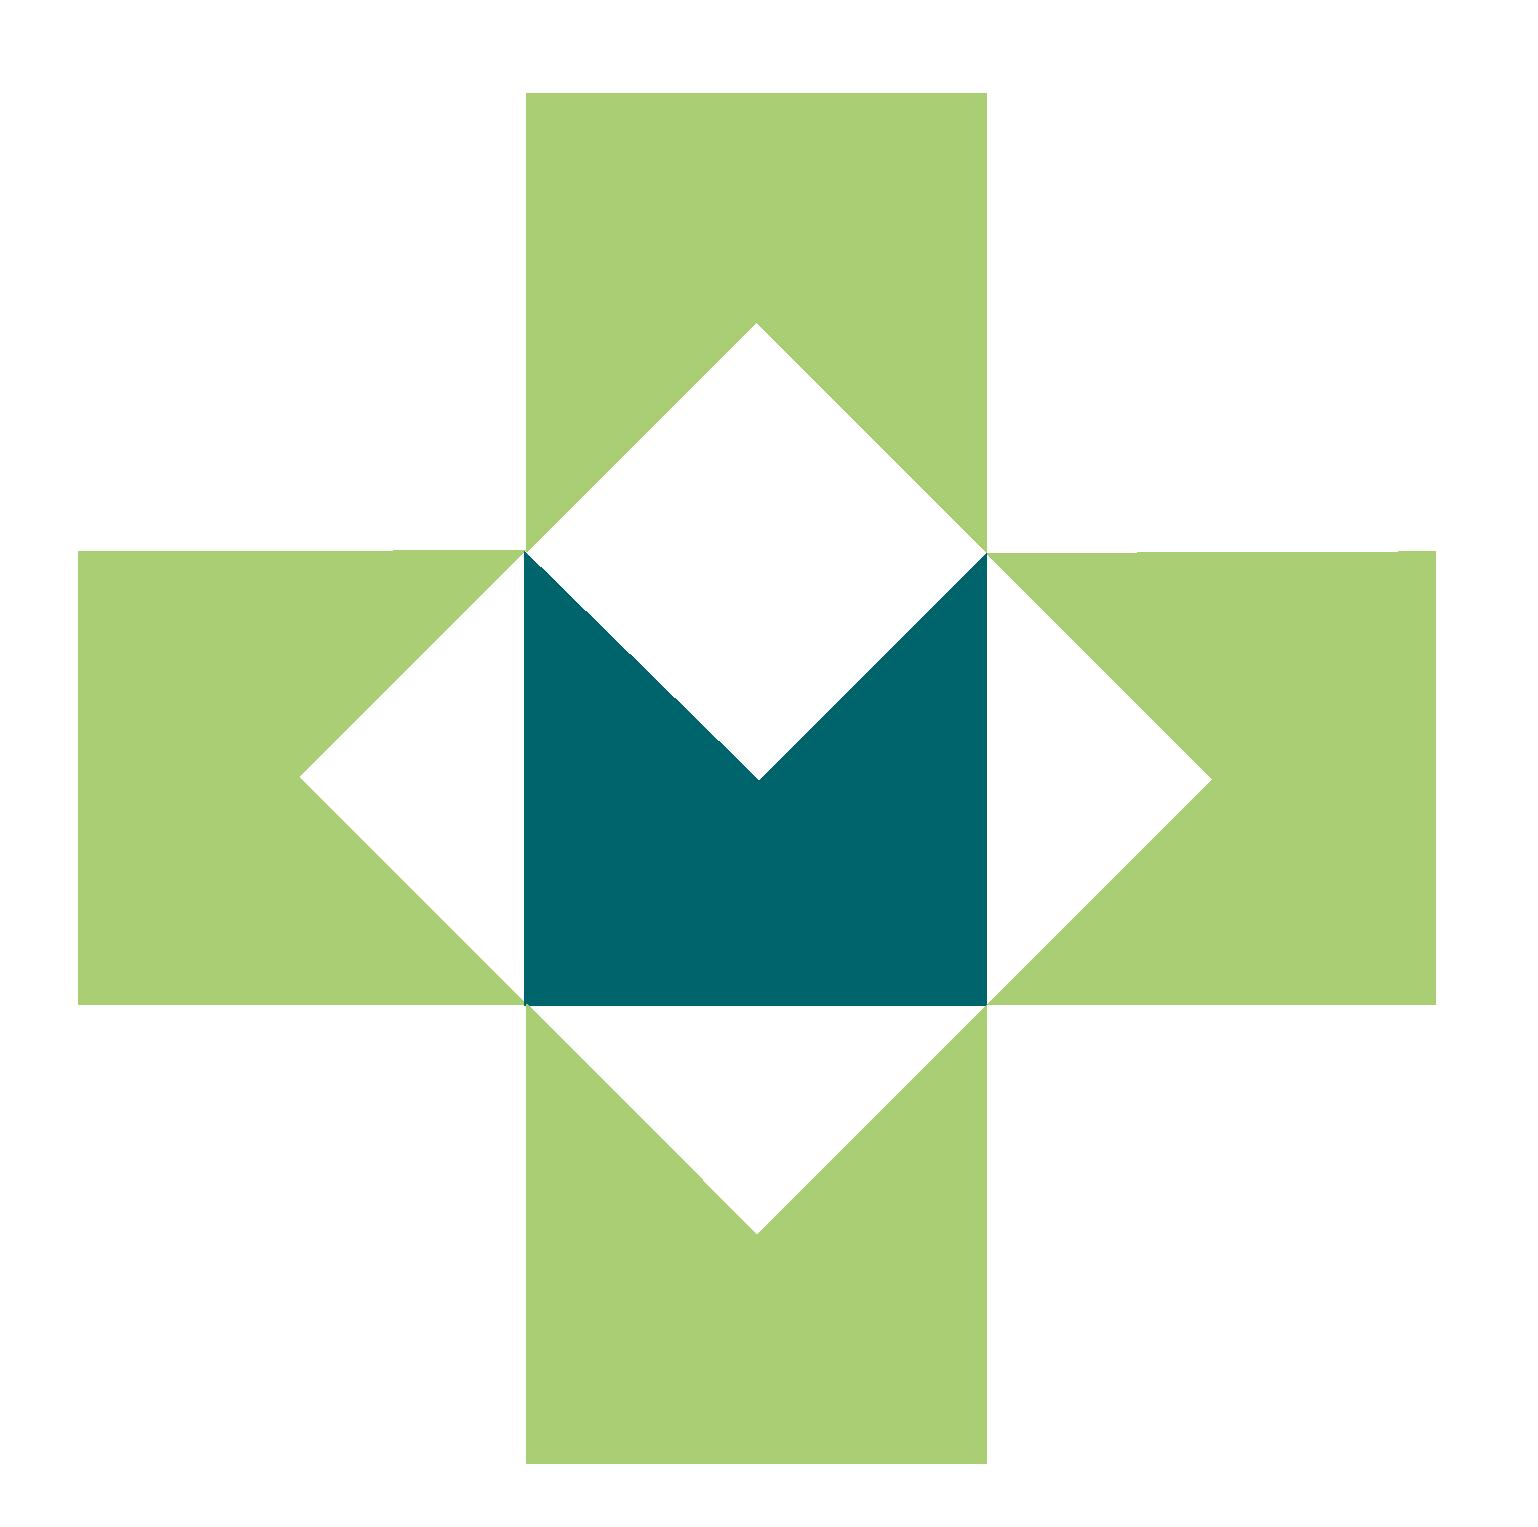 cegedim_pharmacy manager logo-symbol